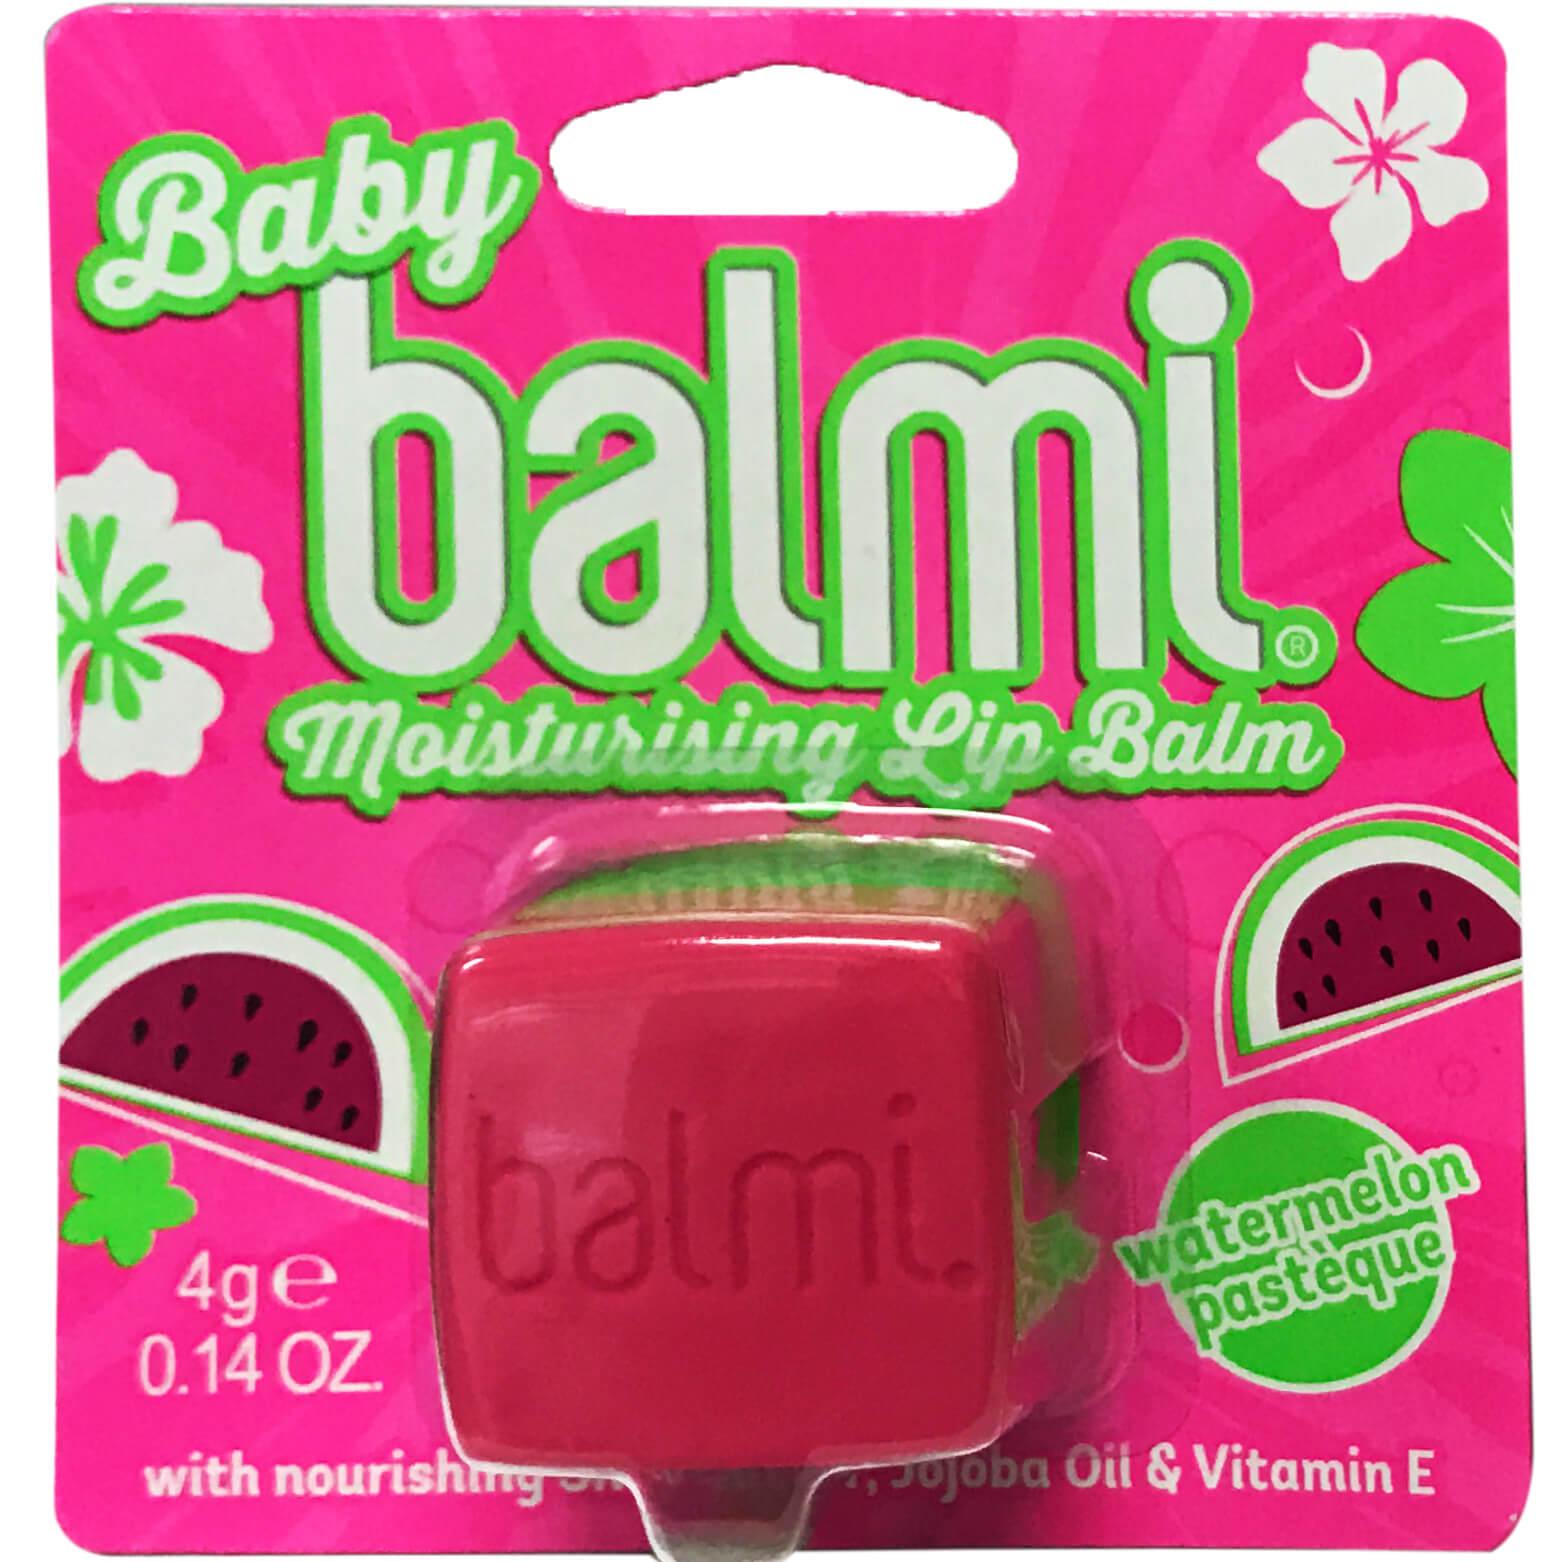 Balmi Baby Balmi Moisturising Lip Balm Ενυδατικό Balm Χειλιών 4g – Watermelon